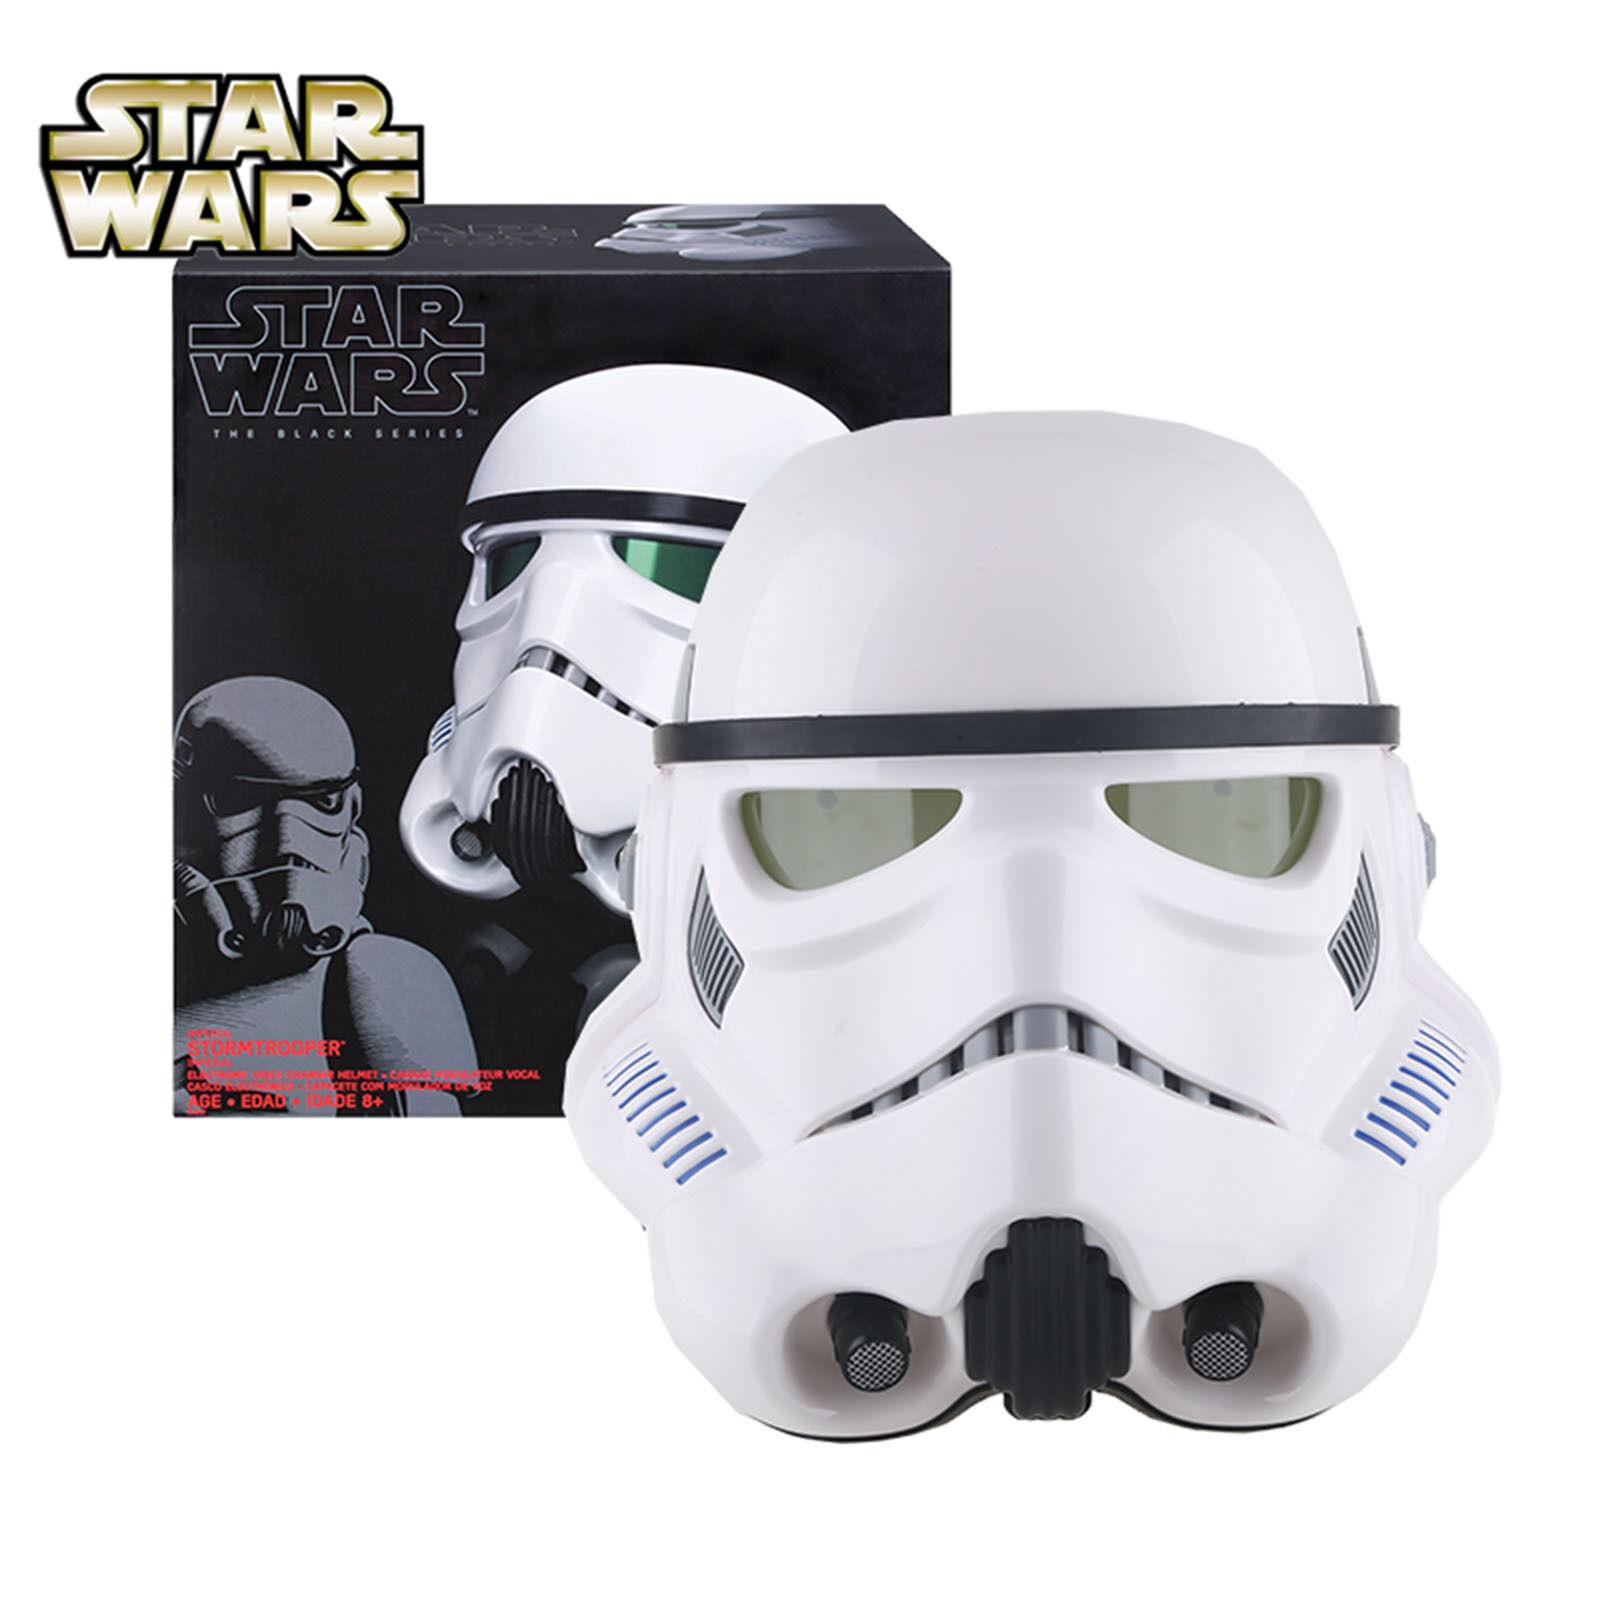 Star Wars Imperial Stormtrooper Elettronico Voice-Changer Voice-Changer Voice-Changer Helmet Natale Regalo ac7f19